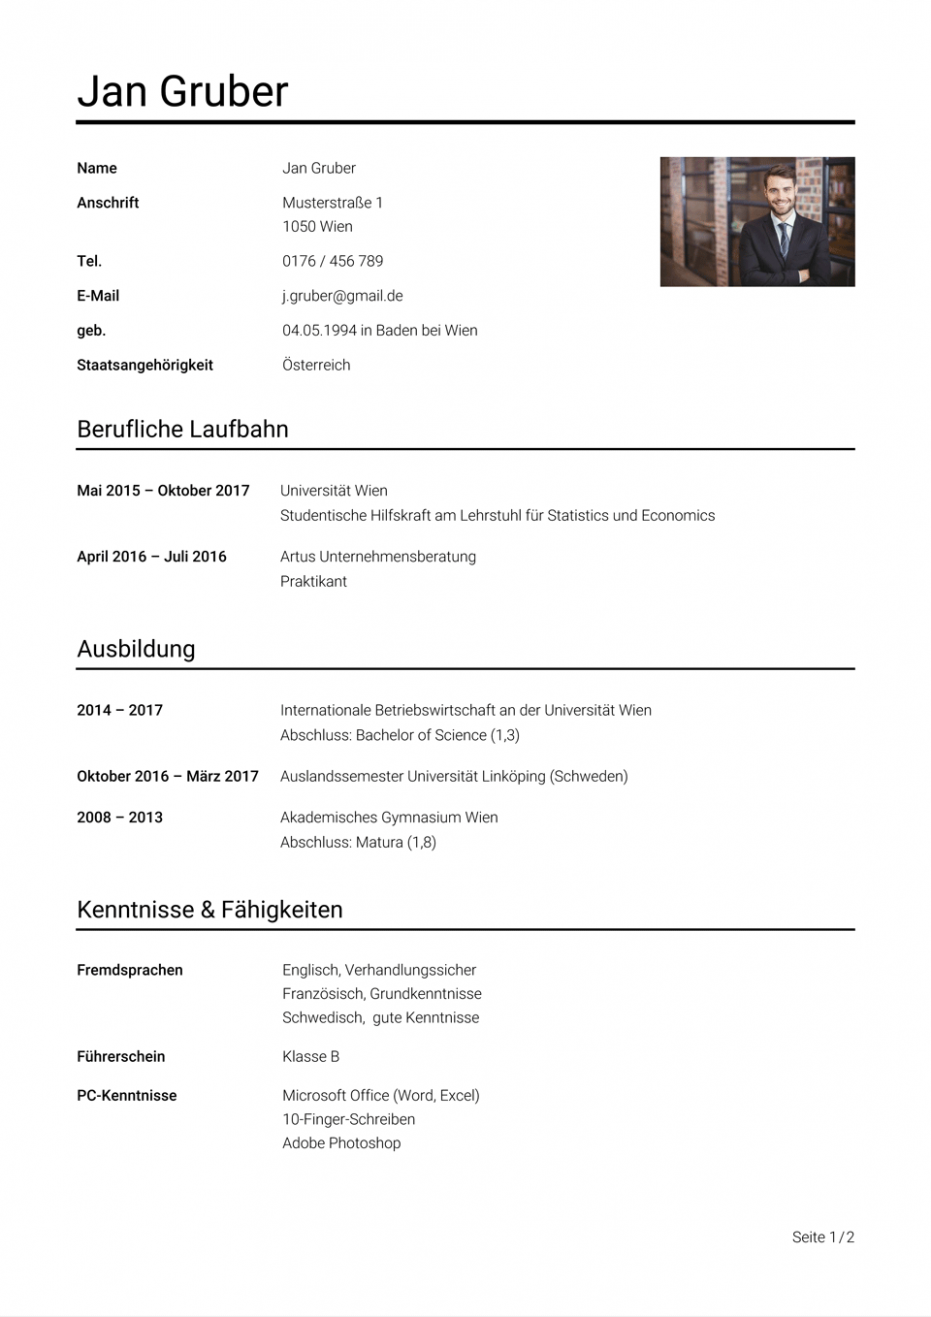 Lebenslauf Muster Osterreich In 2020 Document Templates Templates Design